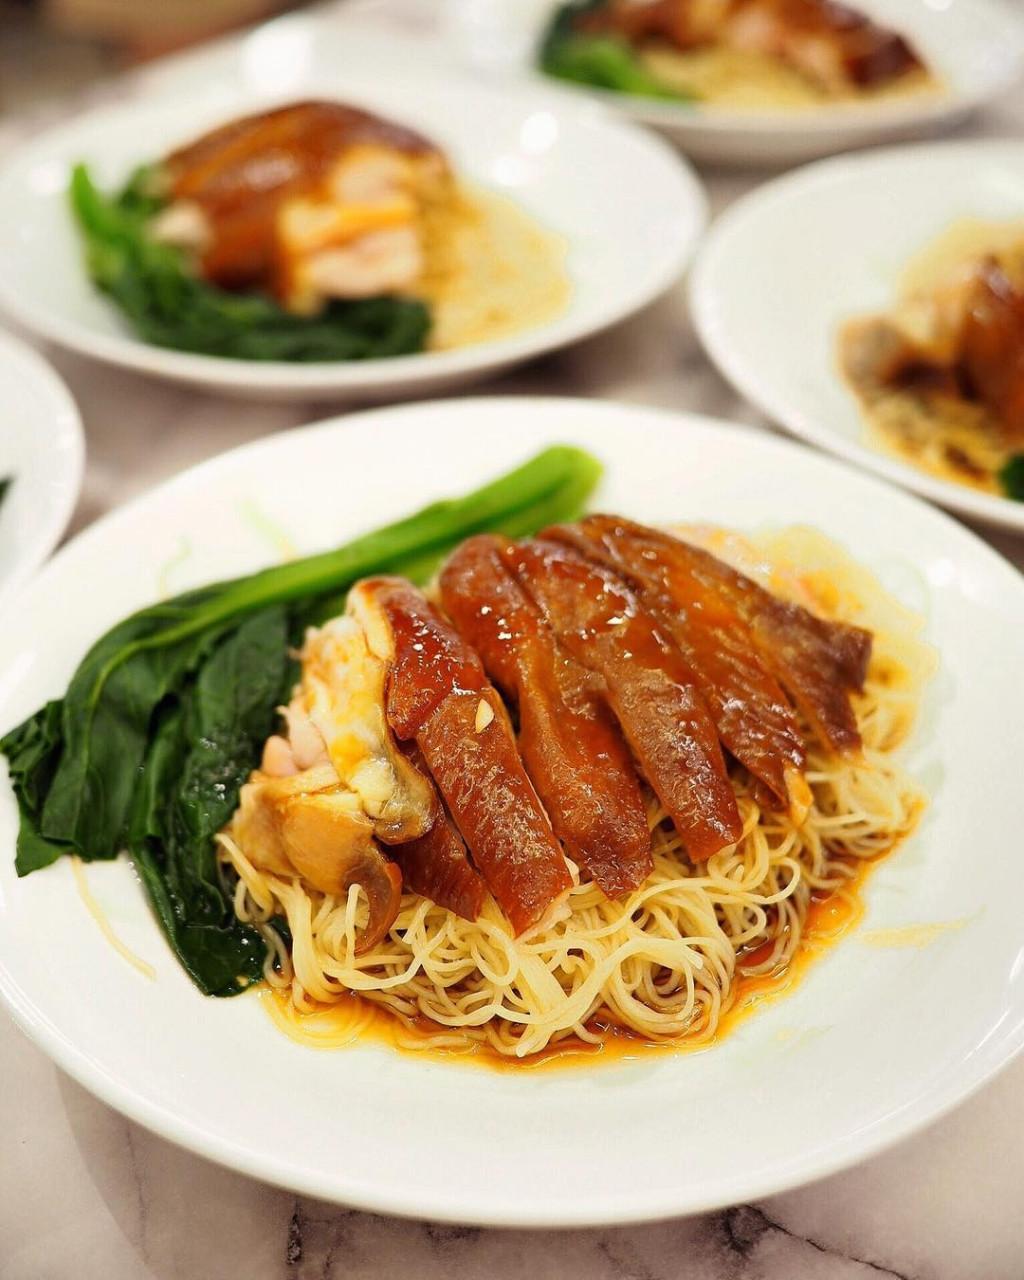 Ho Fook Hei - chicken noodles